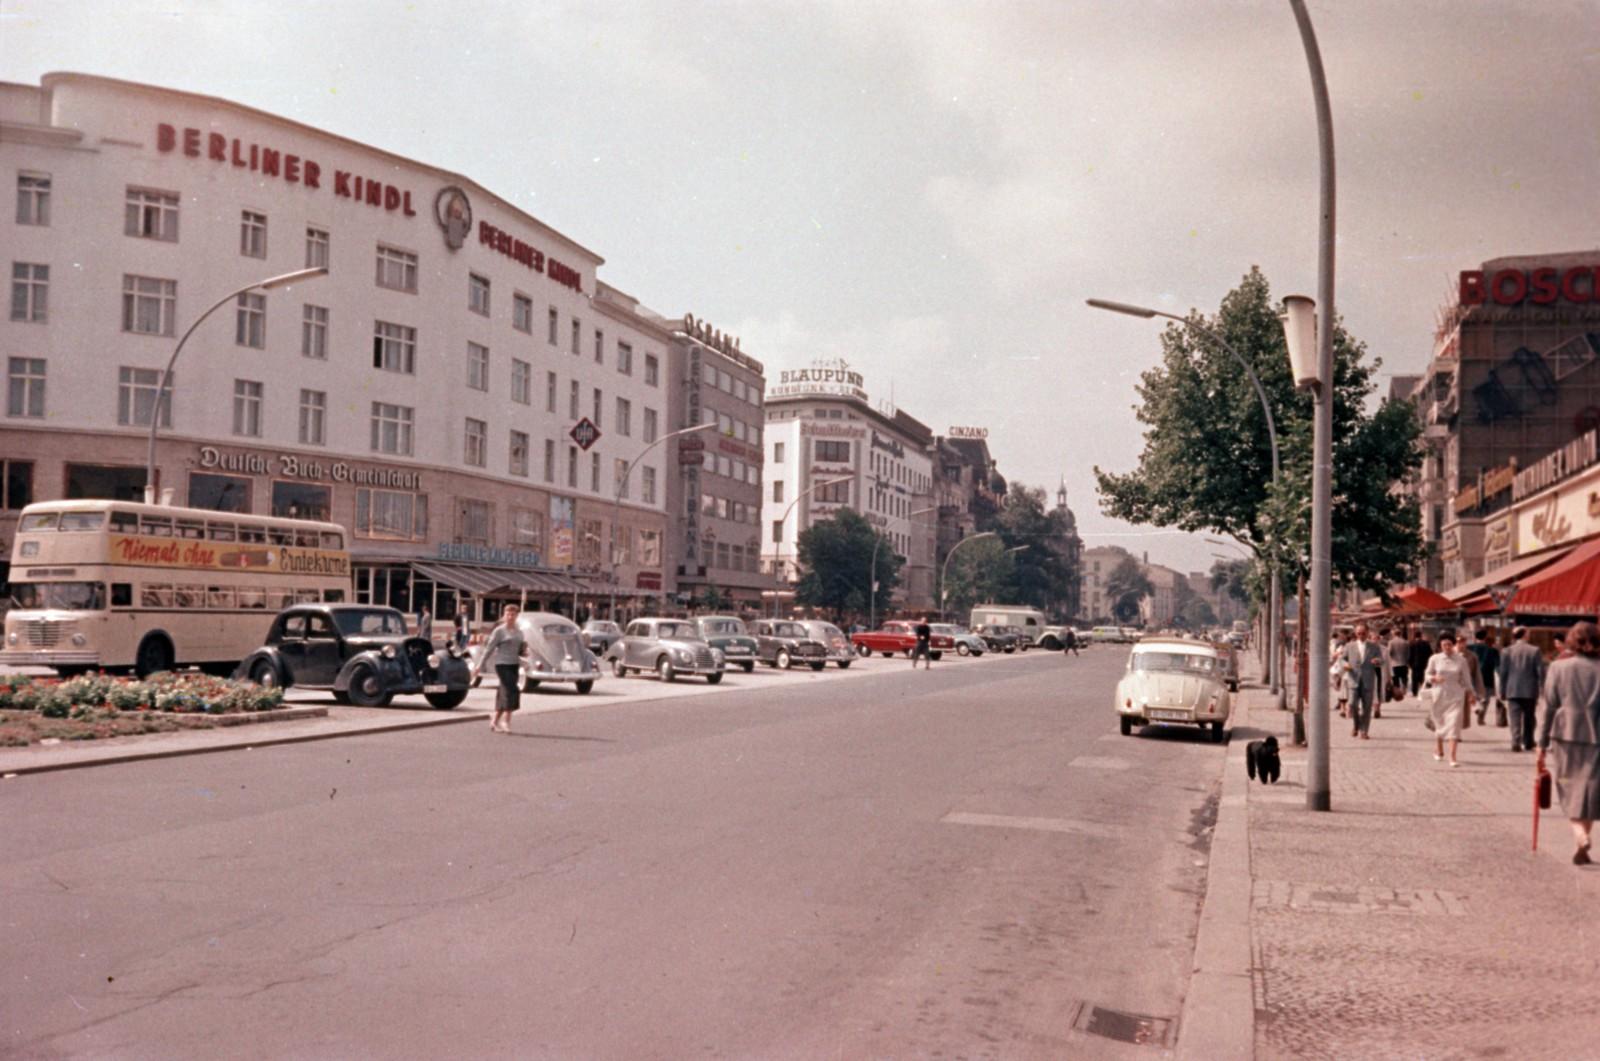 07. Западный Берлин. Курфюрстендамм со стороны Иоахимсталер штрассе